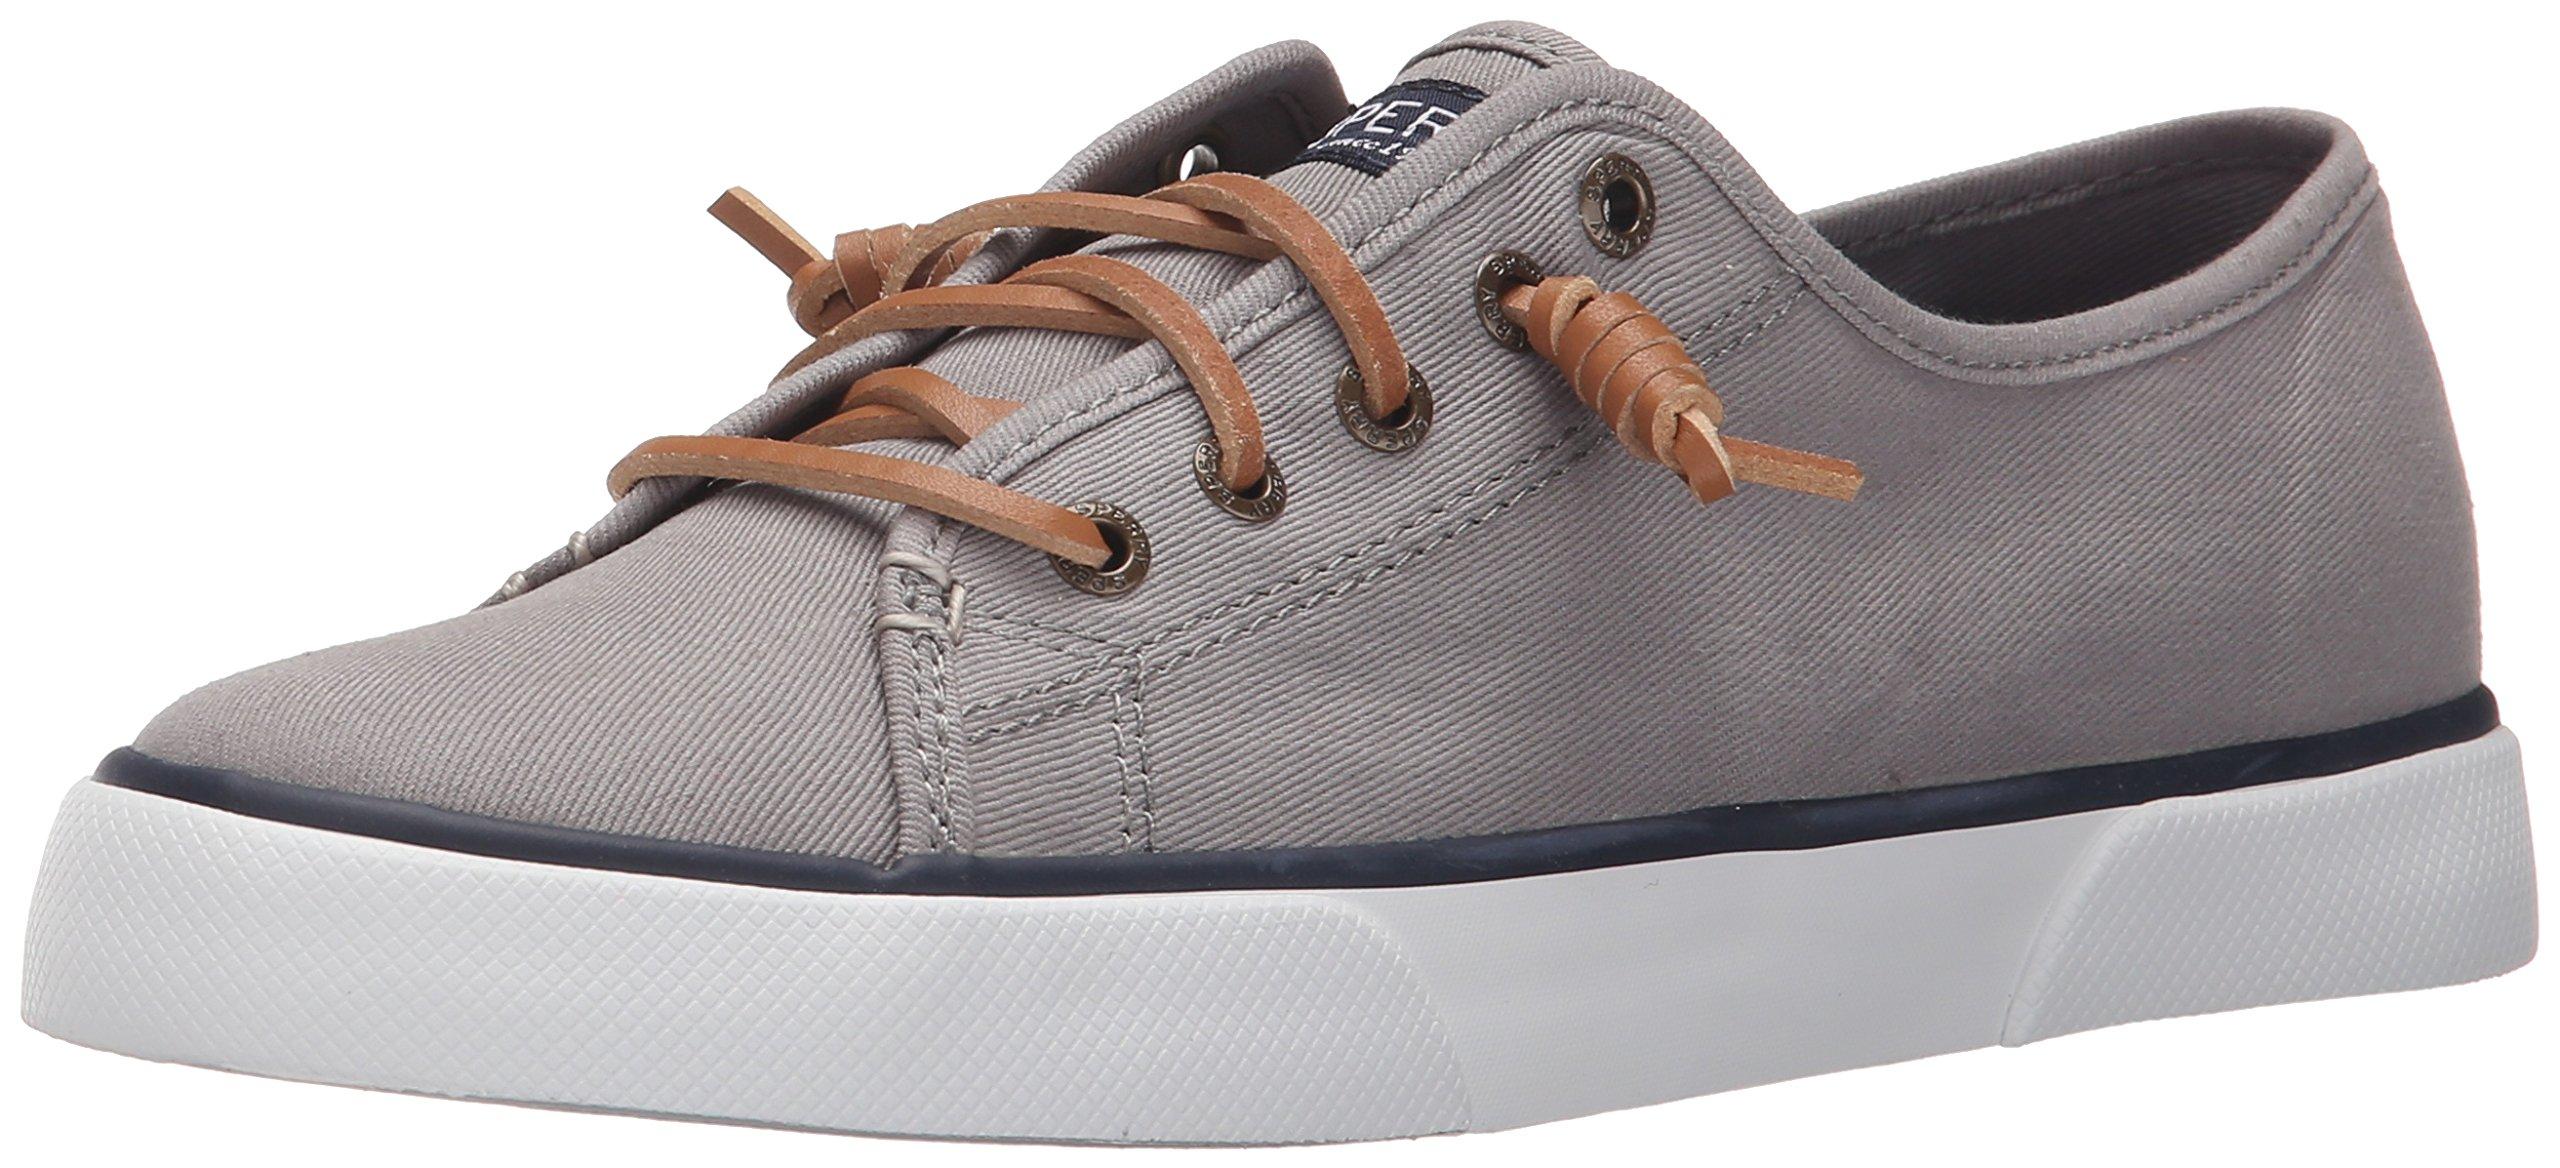 Sperry Top-Sider Women's Pier View Sneaker, Grey, 11 Medium US